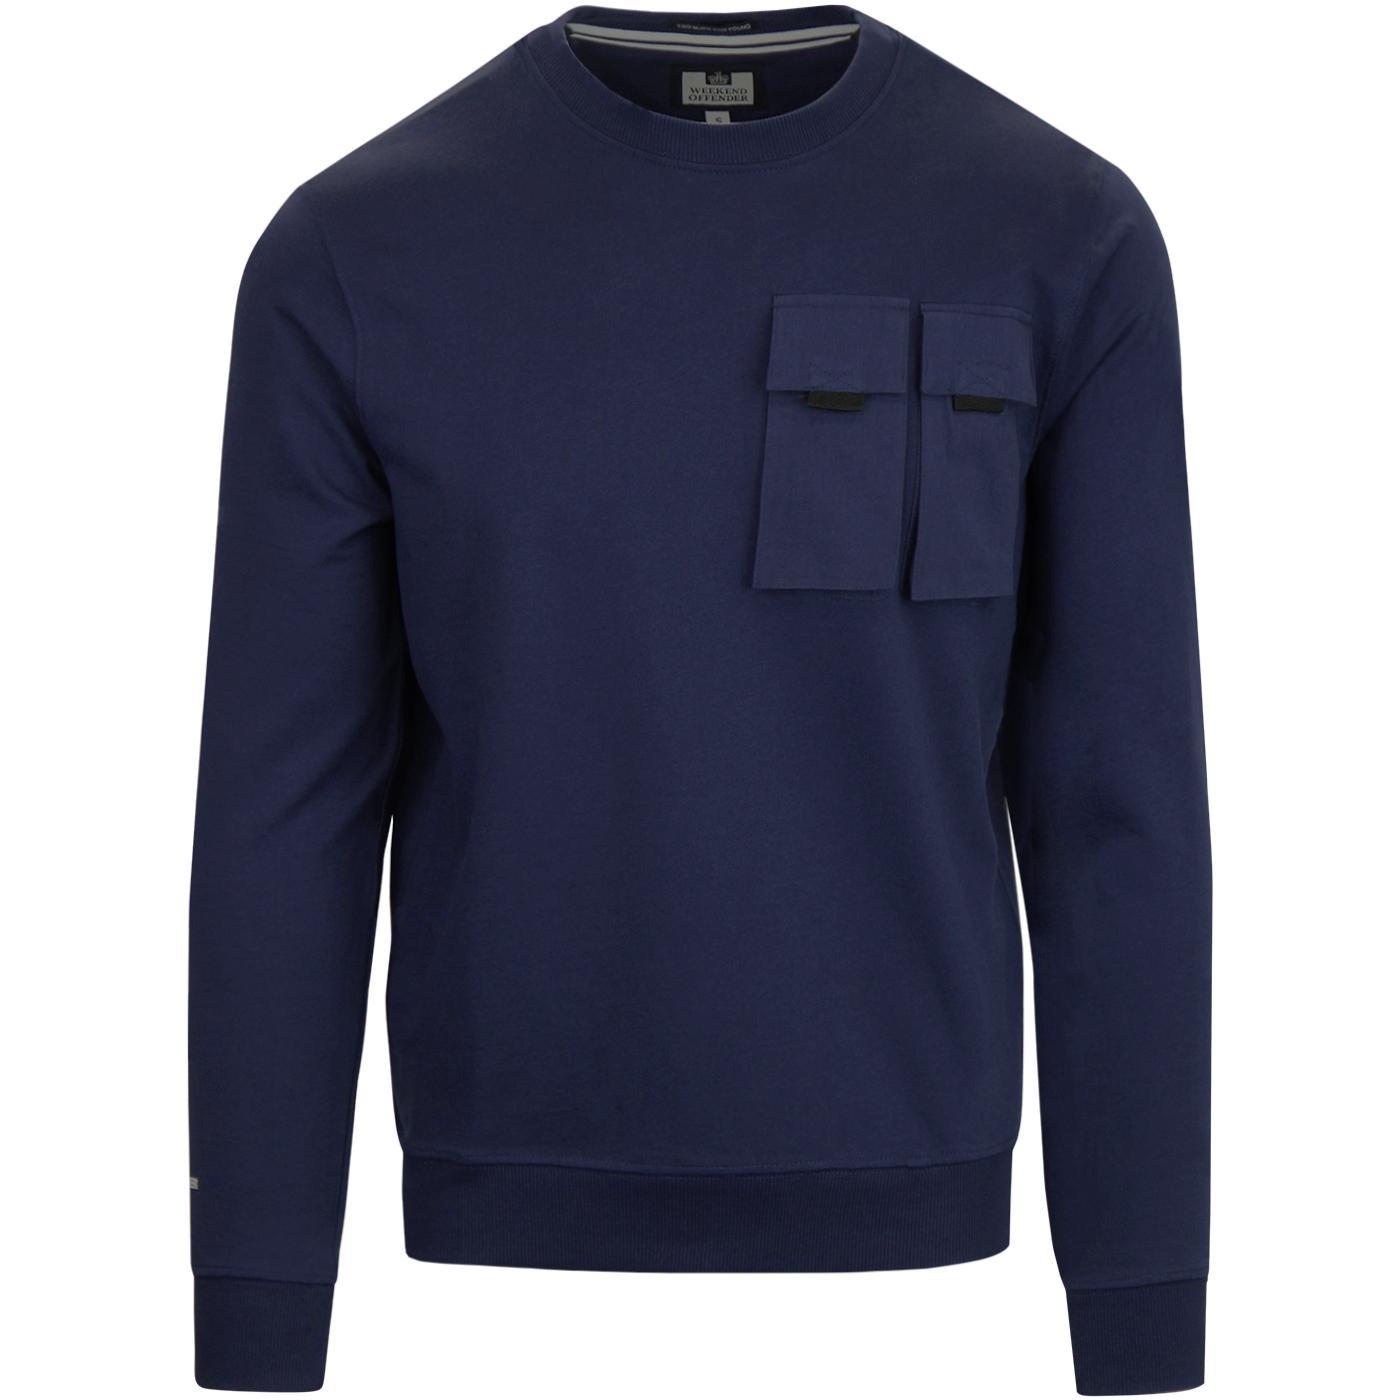 Alfonso WEEKEND OFFENDER Retro Pocket Sweatshirt